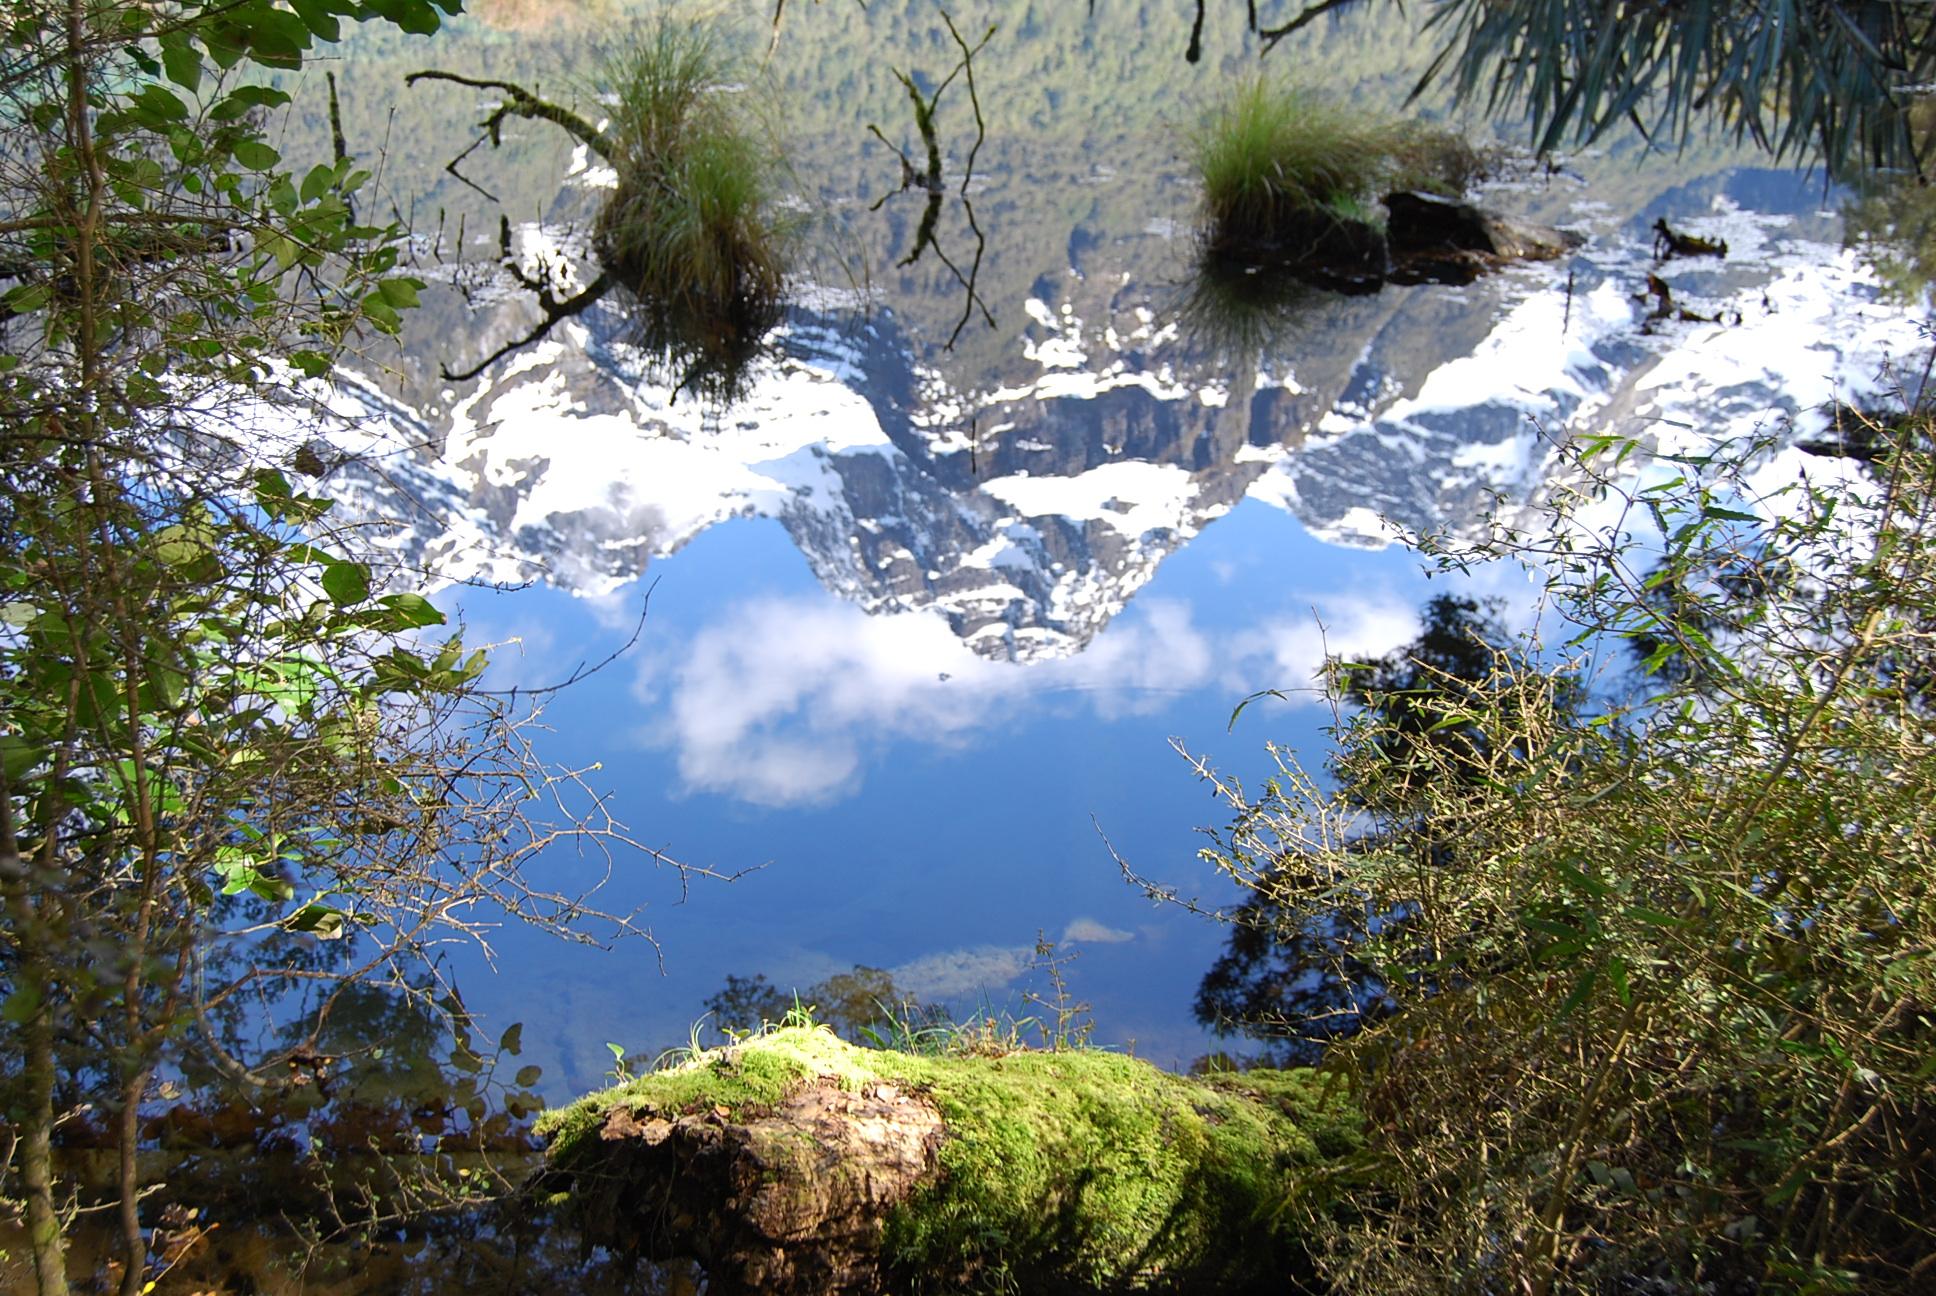 2011-09-23-New-Zealand-Mirror-Mountains-DSC_9634